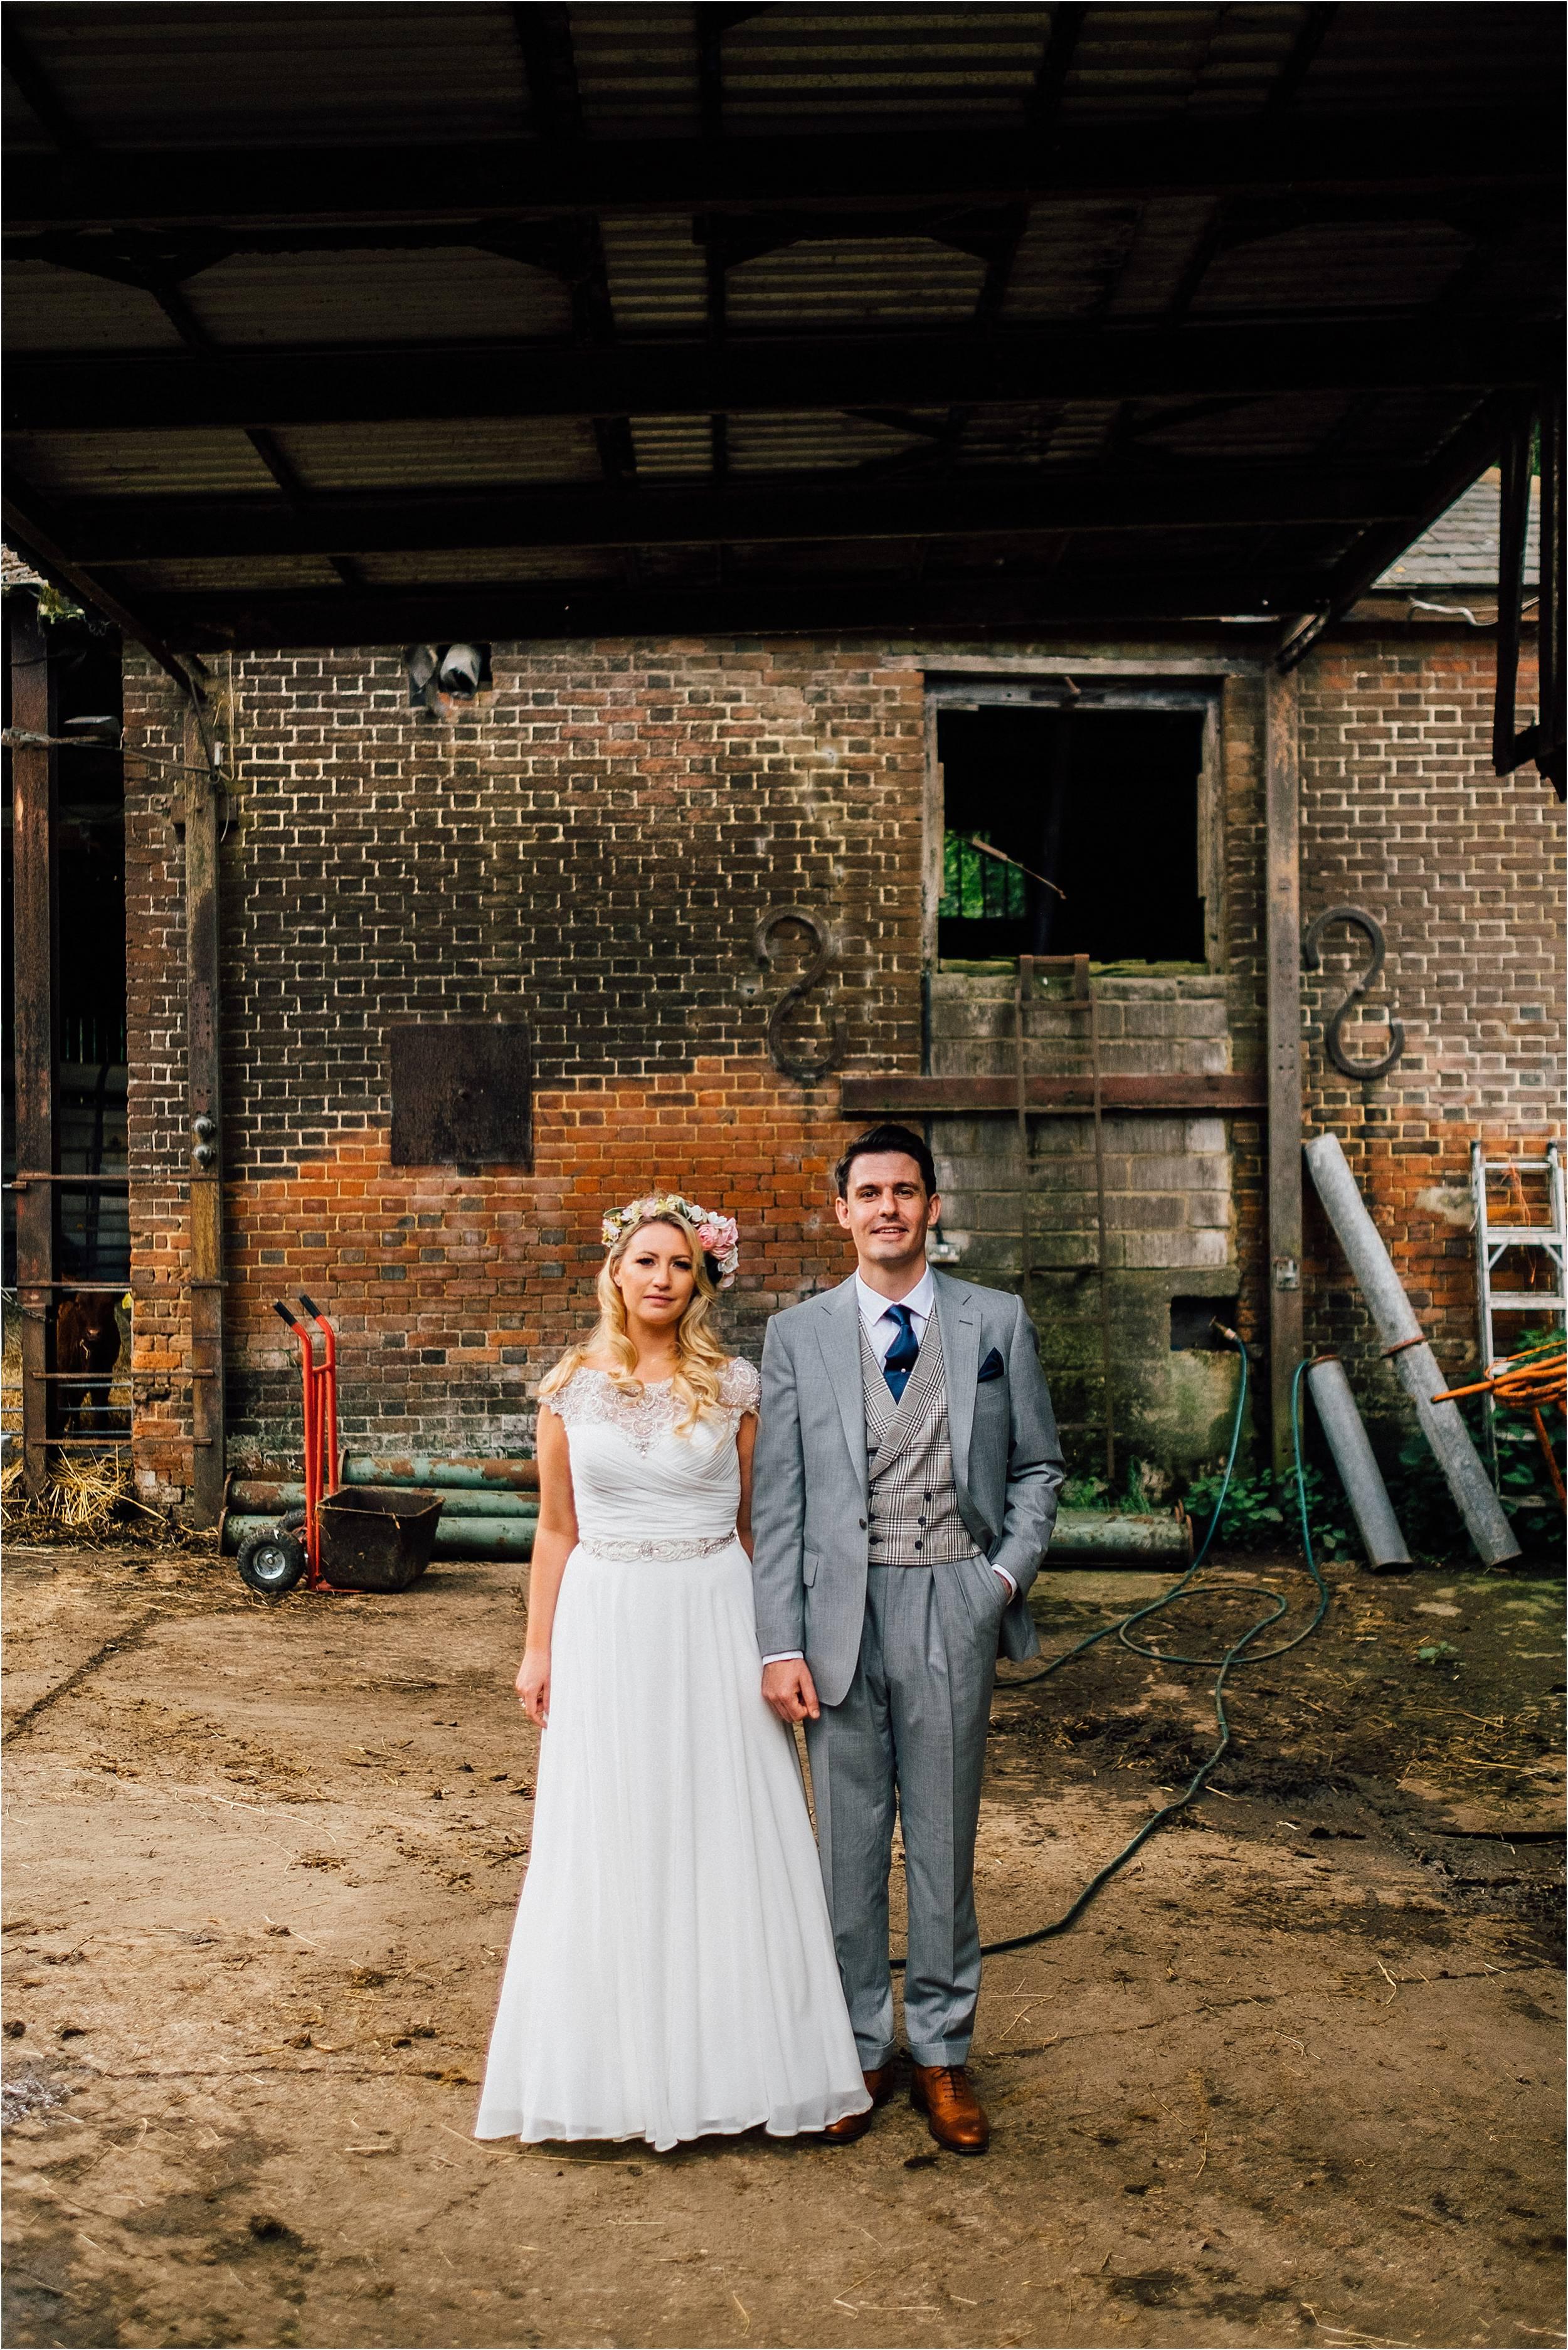 Surrey Hookhouse Farm Wedding Photographer_0105.jpg